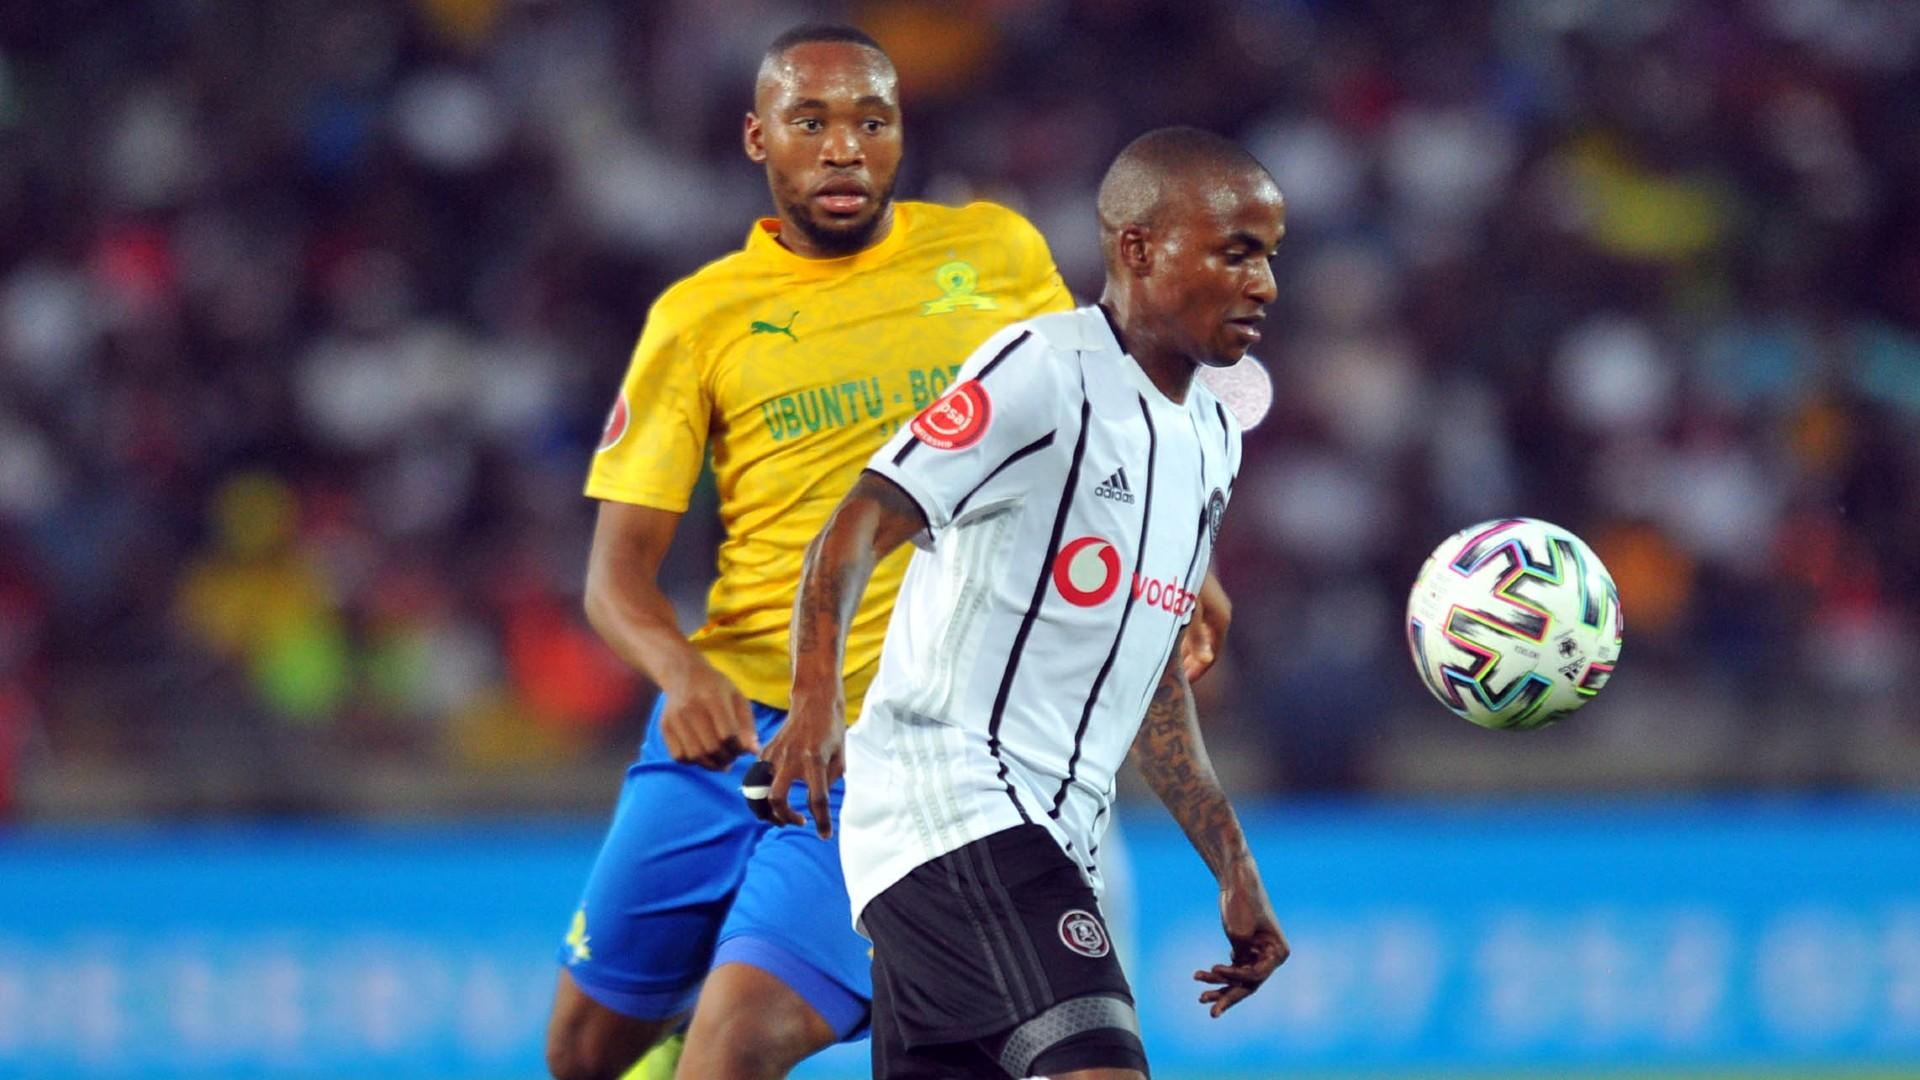 Mamelodi Sundowns vs Orlando Pirates: Five players who could decide Gauteng Derby